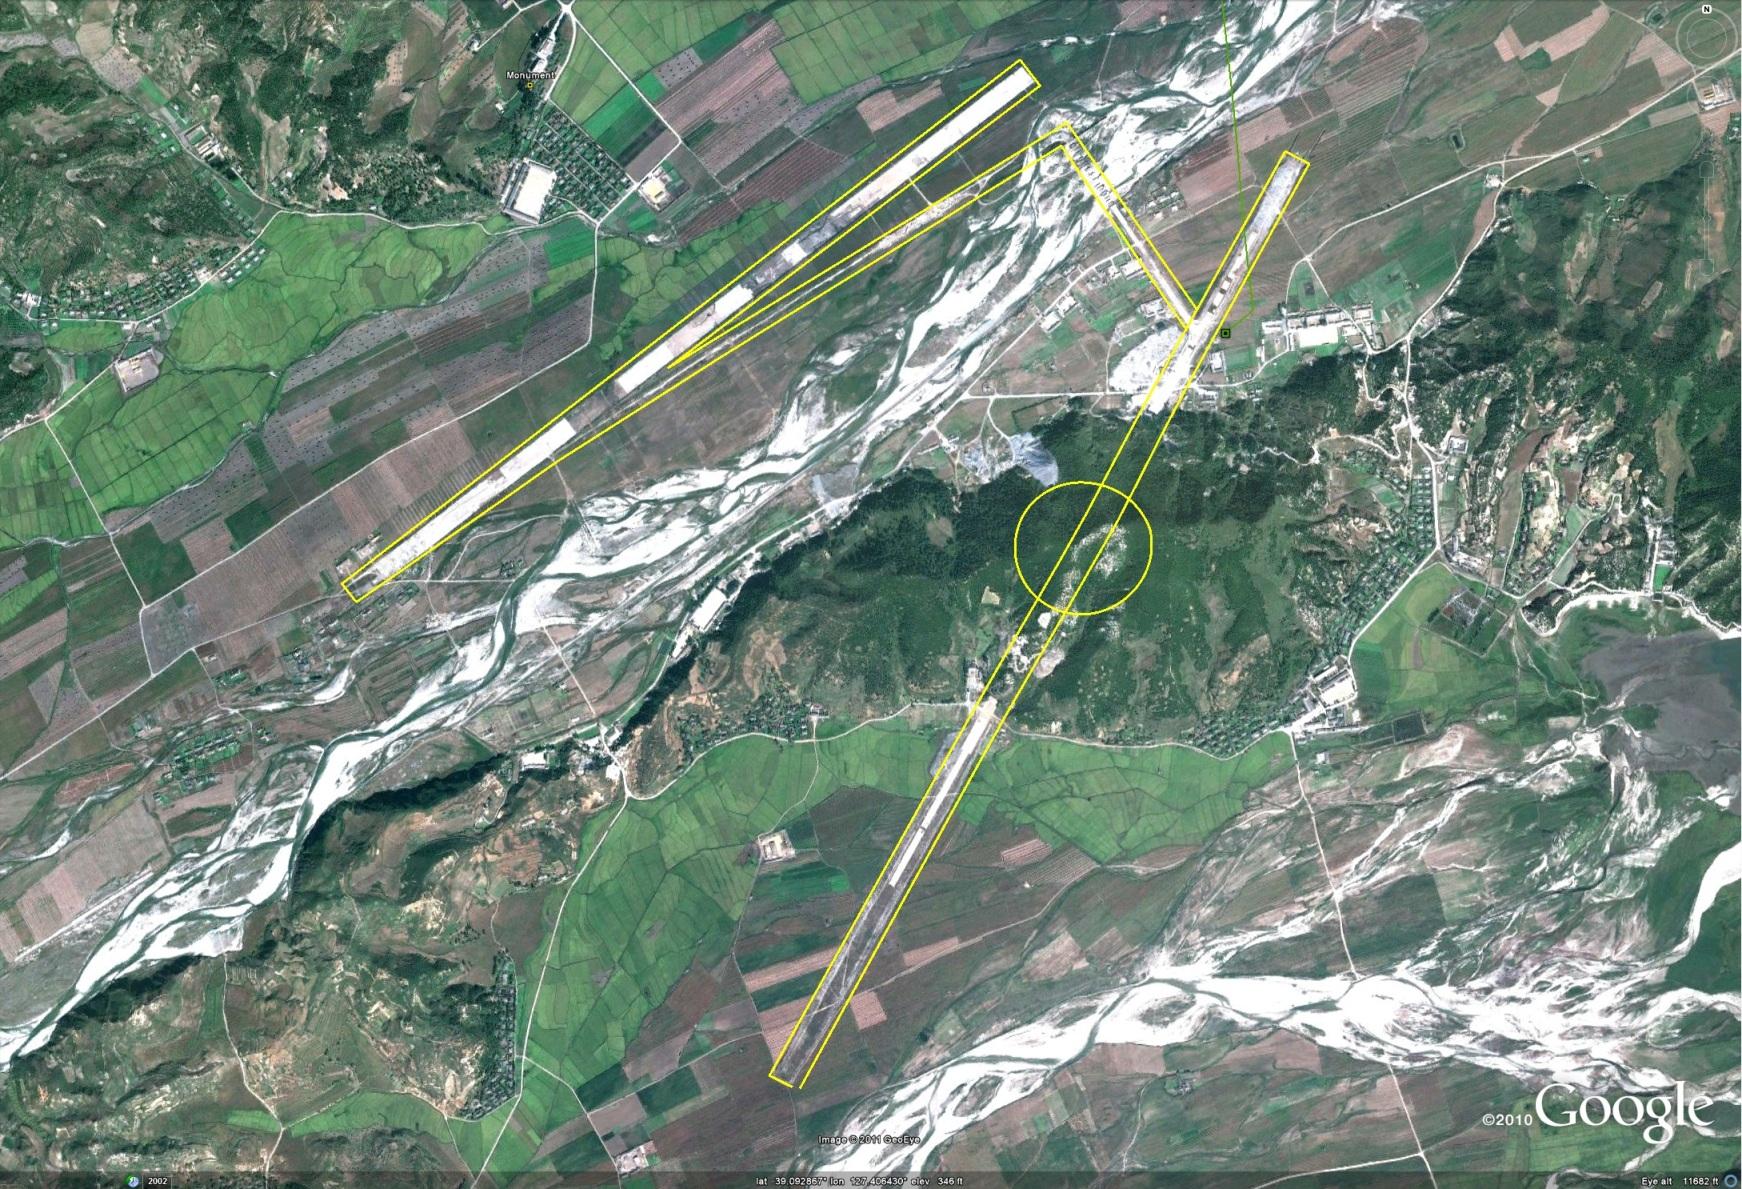 North Korean Economy Watch Korean Peoples Army - Google map us base korea